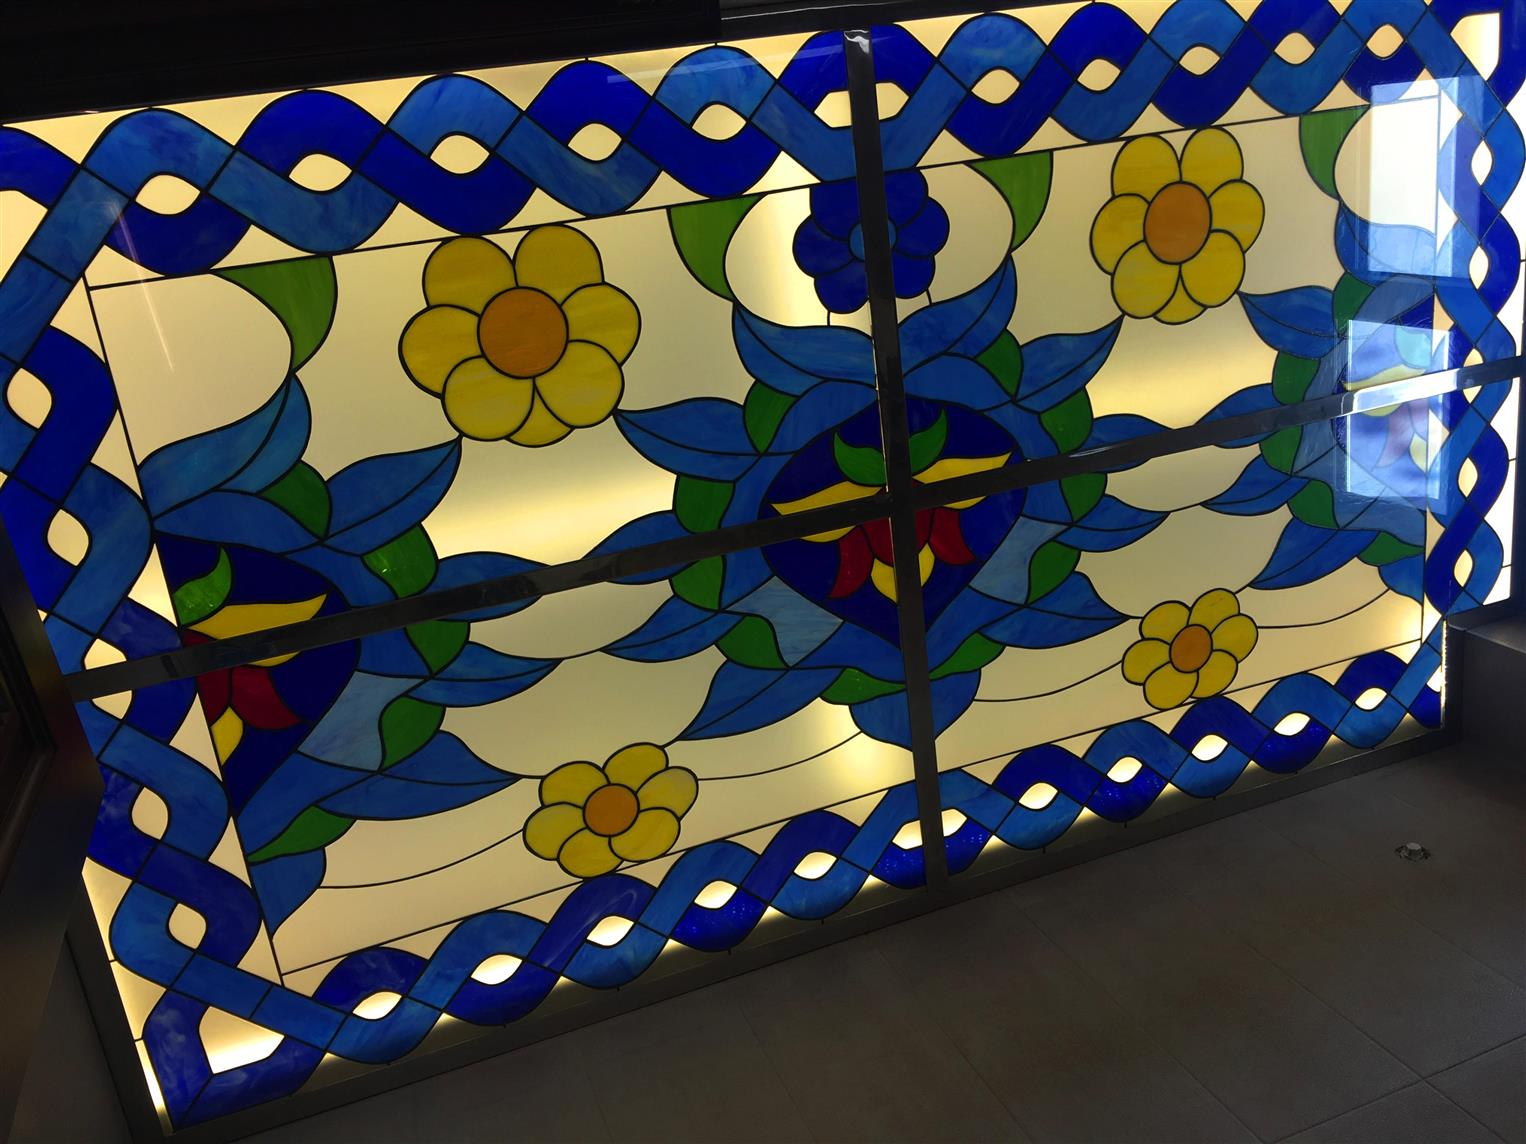 hamam-banyo-tavan-vitraylari20171221185225198.jpg izmir vitray çalışması